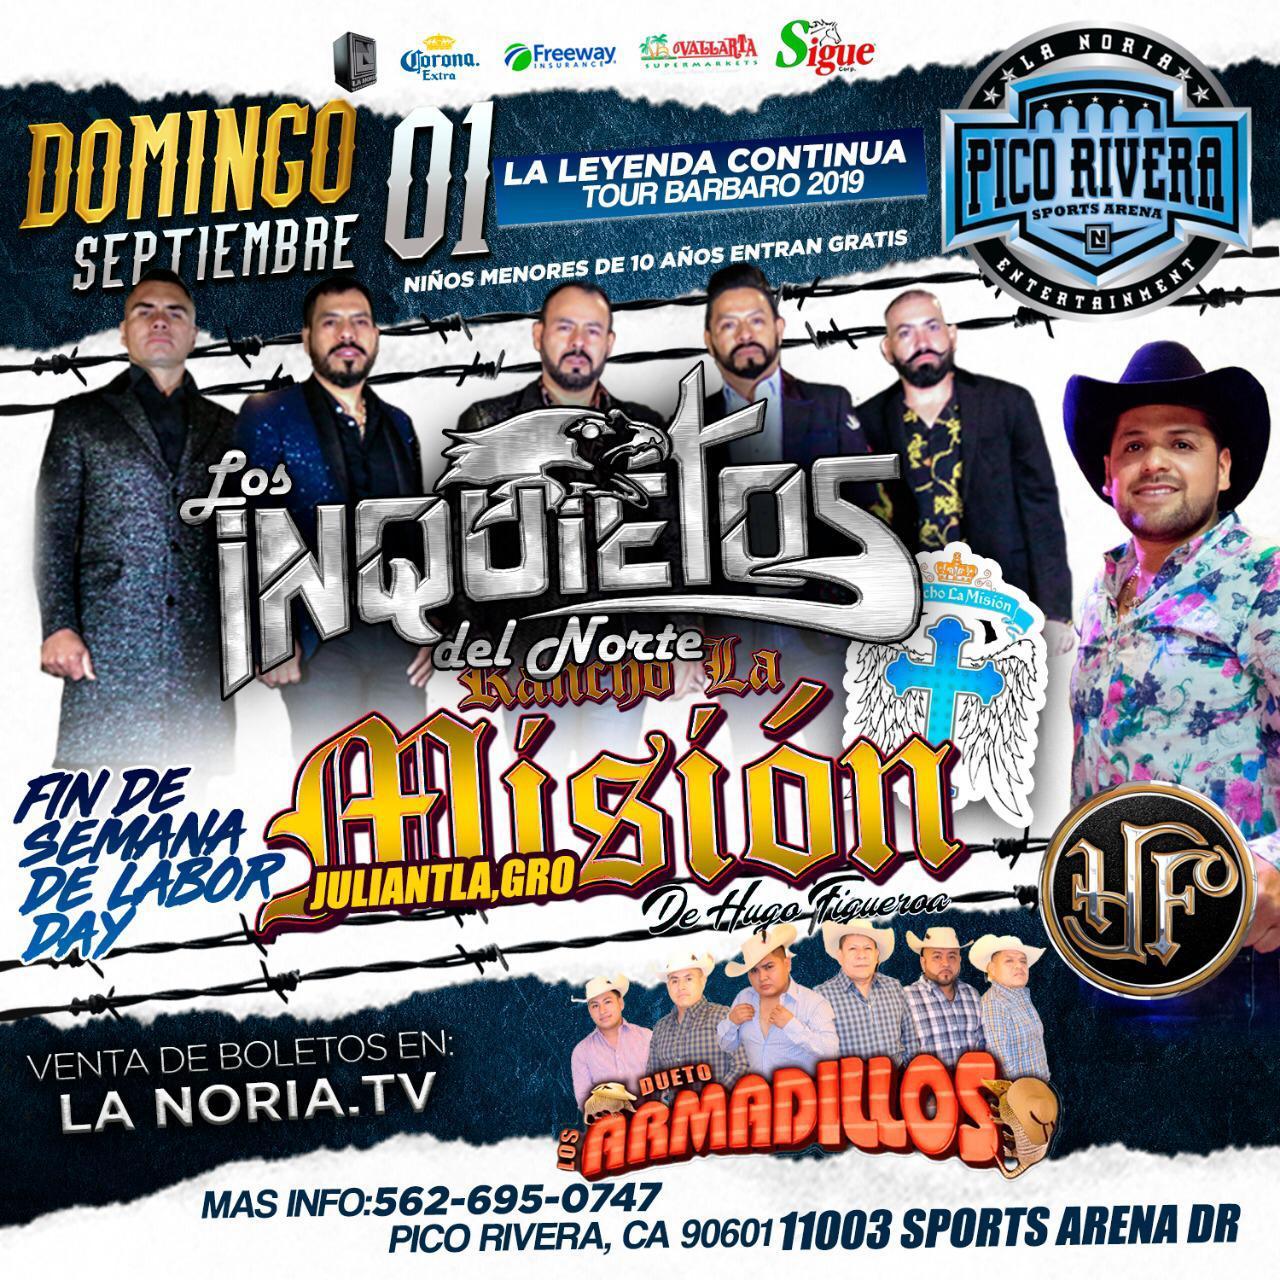 RANCHO LA MISION DE HUGO FIGUEROA - LA LEYENDA CONTINUA.....Sunday, September 1, 2019, 1:00 pm